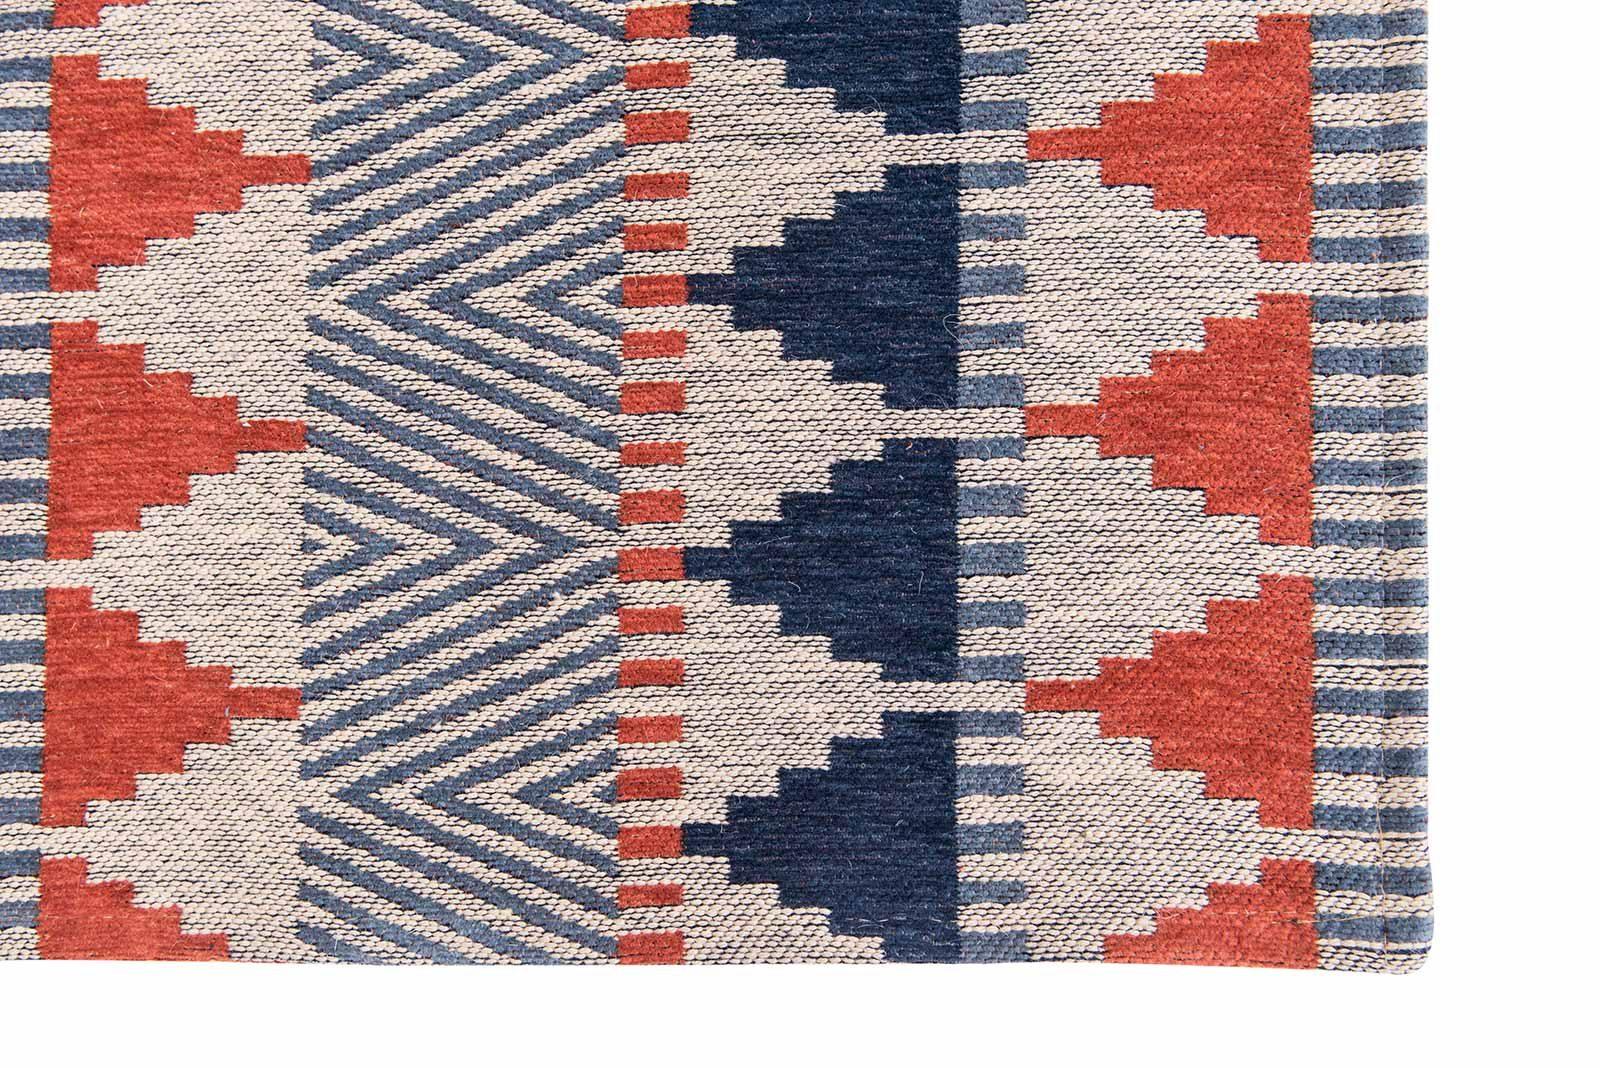 Louis De Poortere alfombras Villa Nova LX 8767 Tobi Indigo Tabasco corner